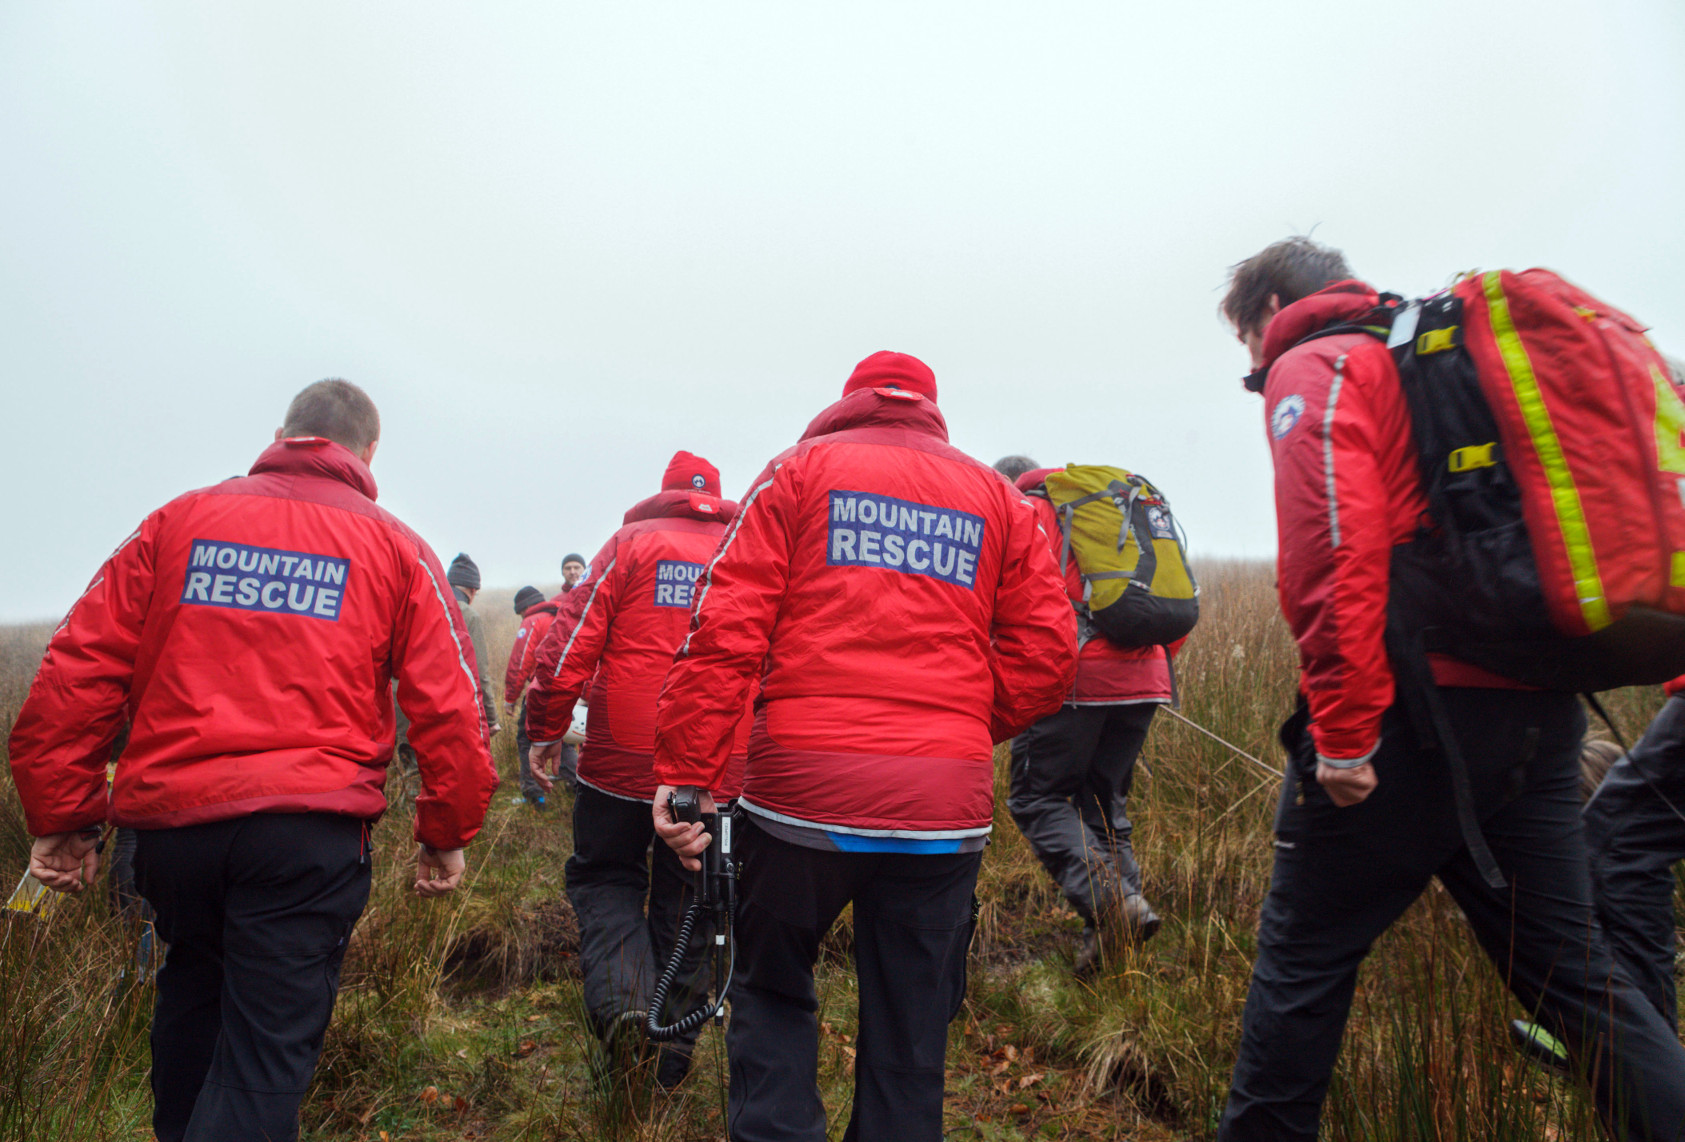 BBC Oneness - Mountain Rescue, Photograph